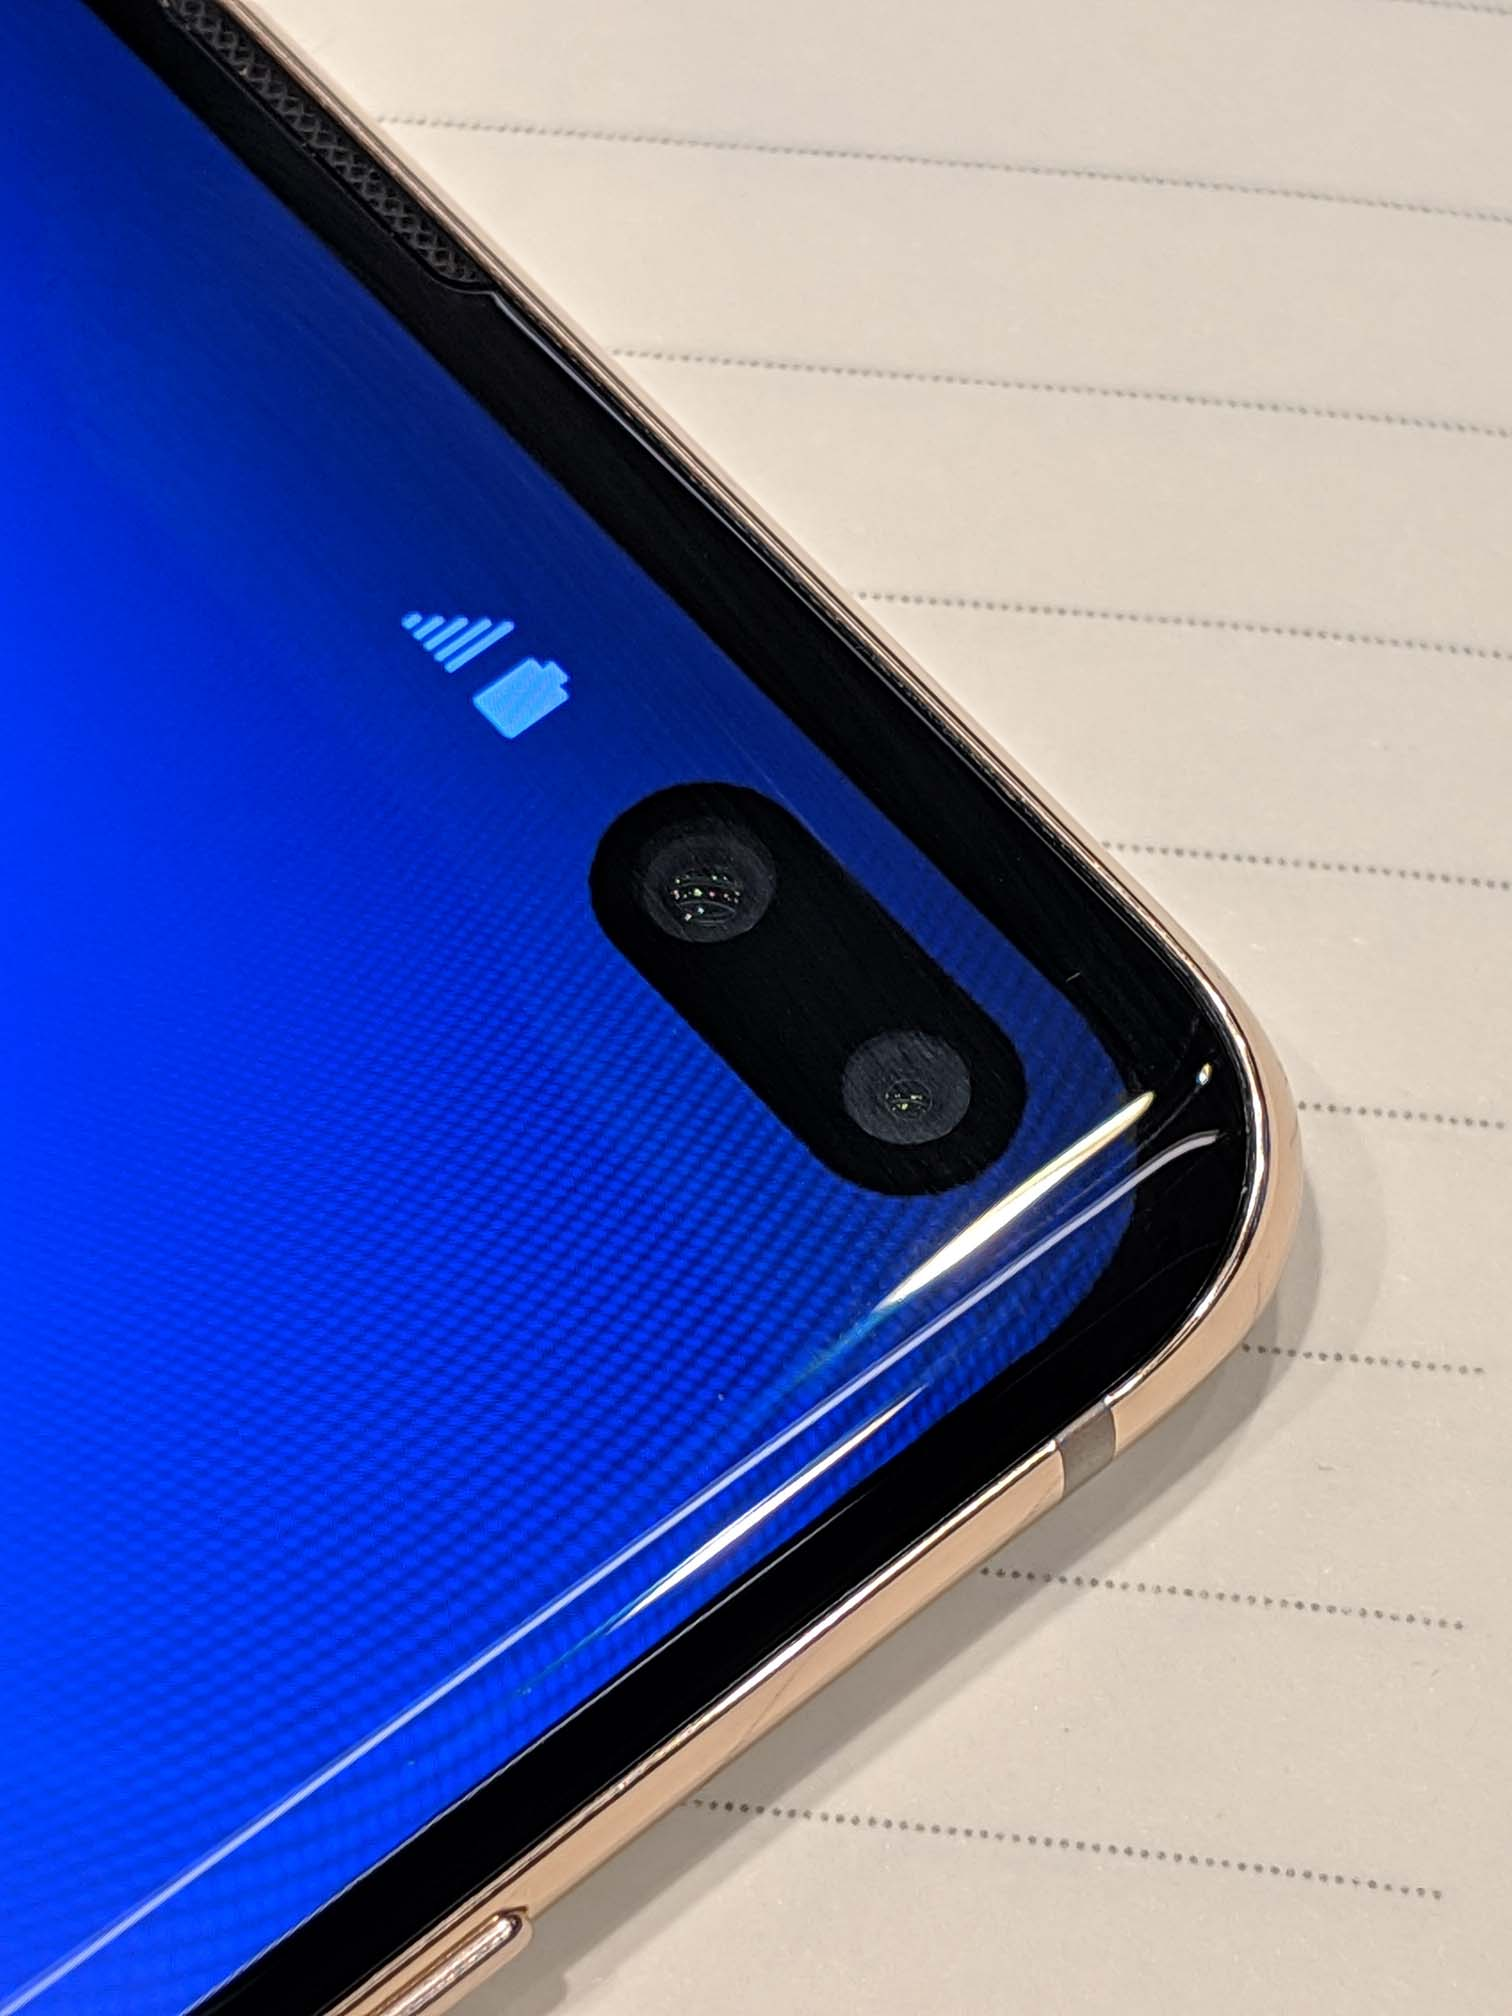 Samsung Galaxy S10e, Galaxy S10, and Galaxy S10+ first